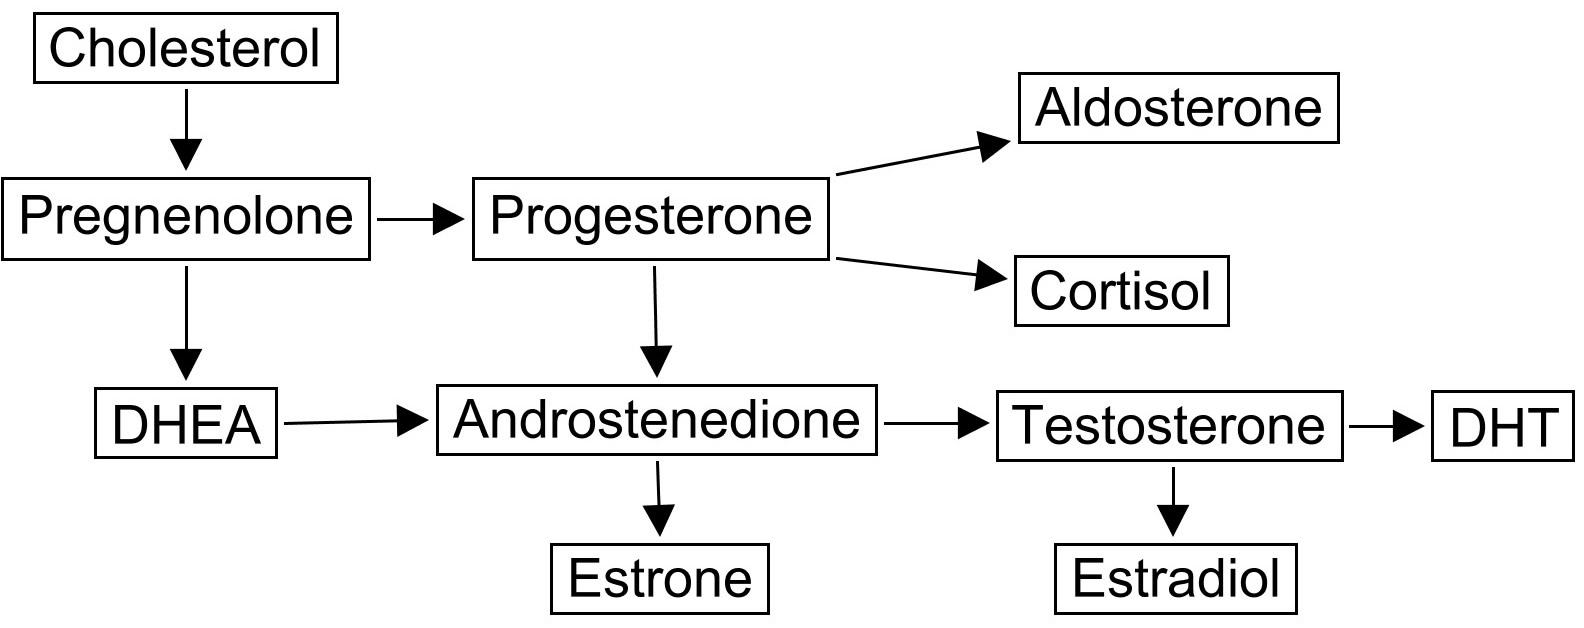 Equibolin Hi Techs Legal Boldenone Targeted Prohormone